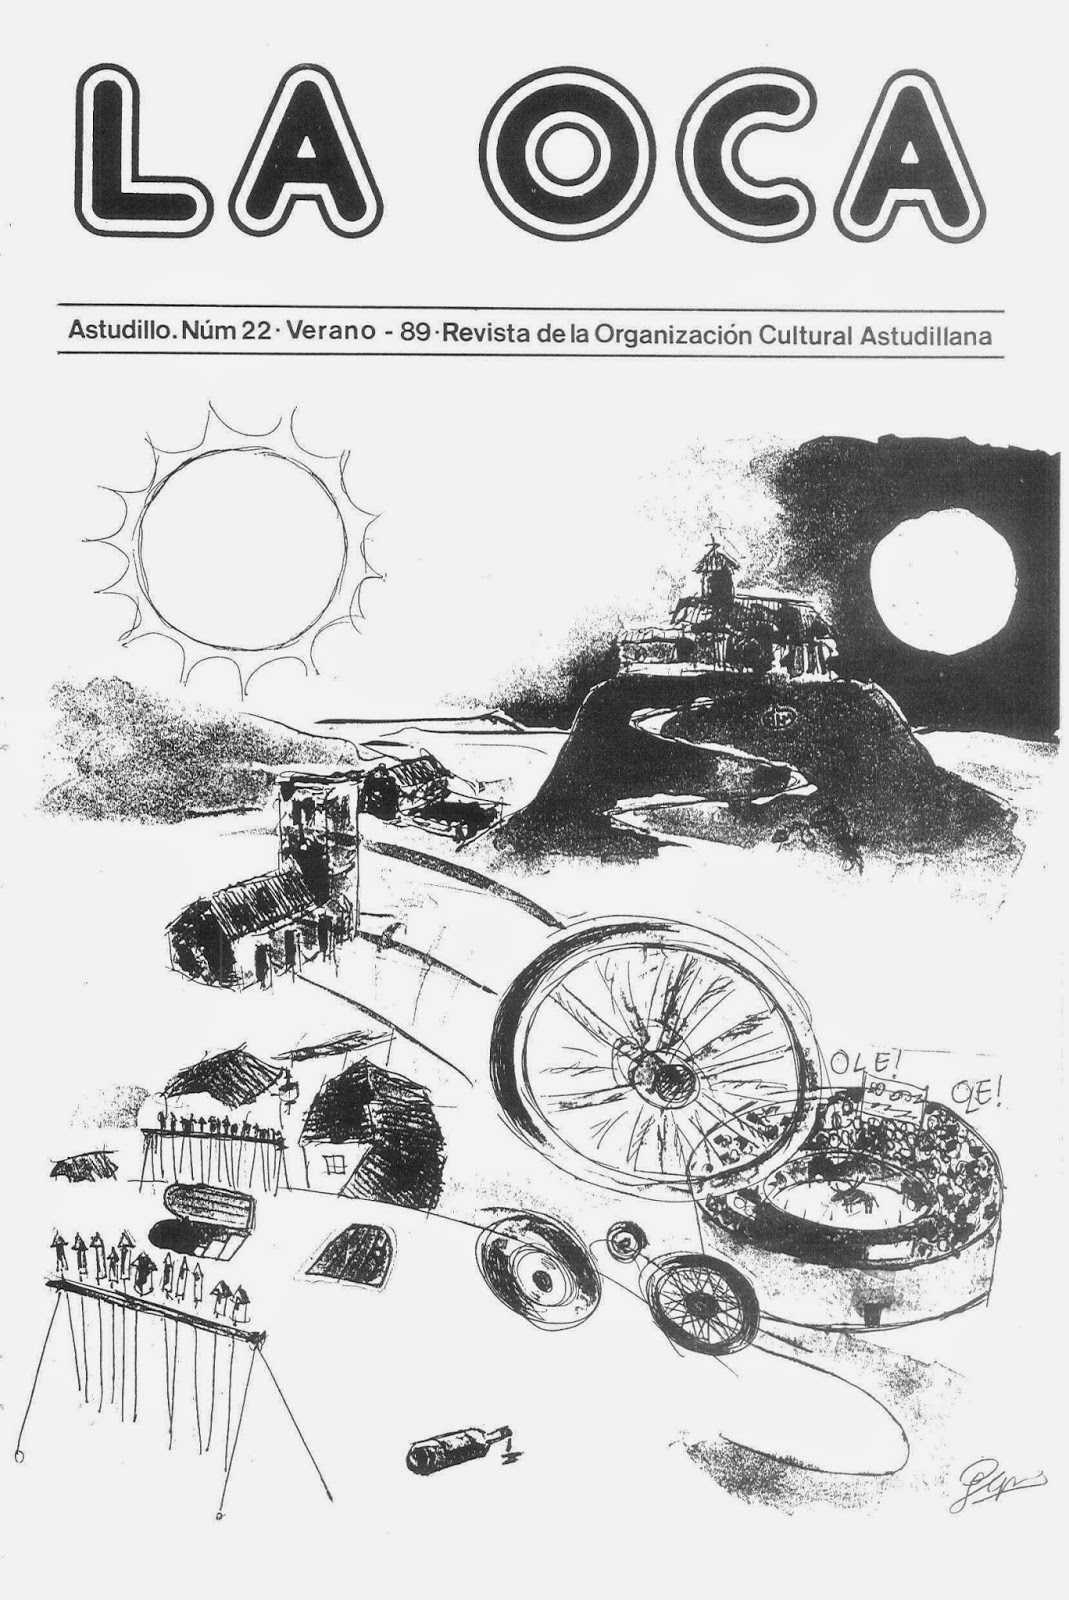 http://es.scribd.com/doc/223718406/La-Oca-n-22-Verano-89